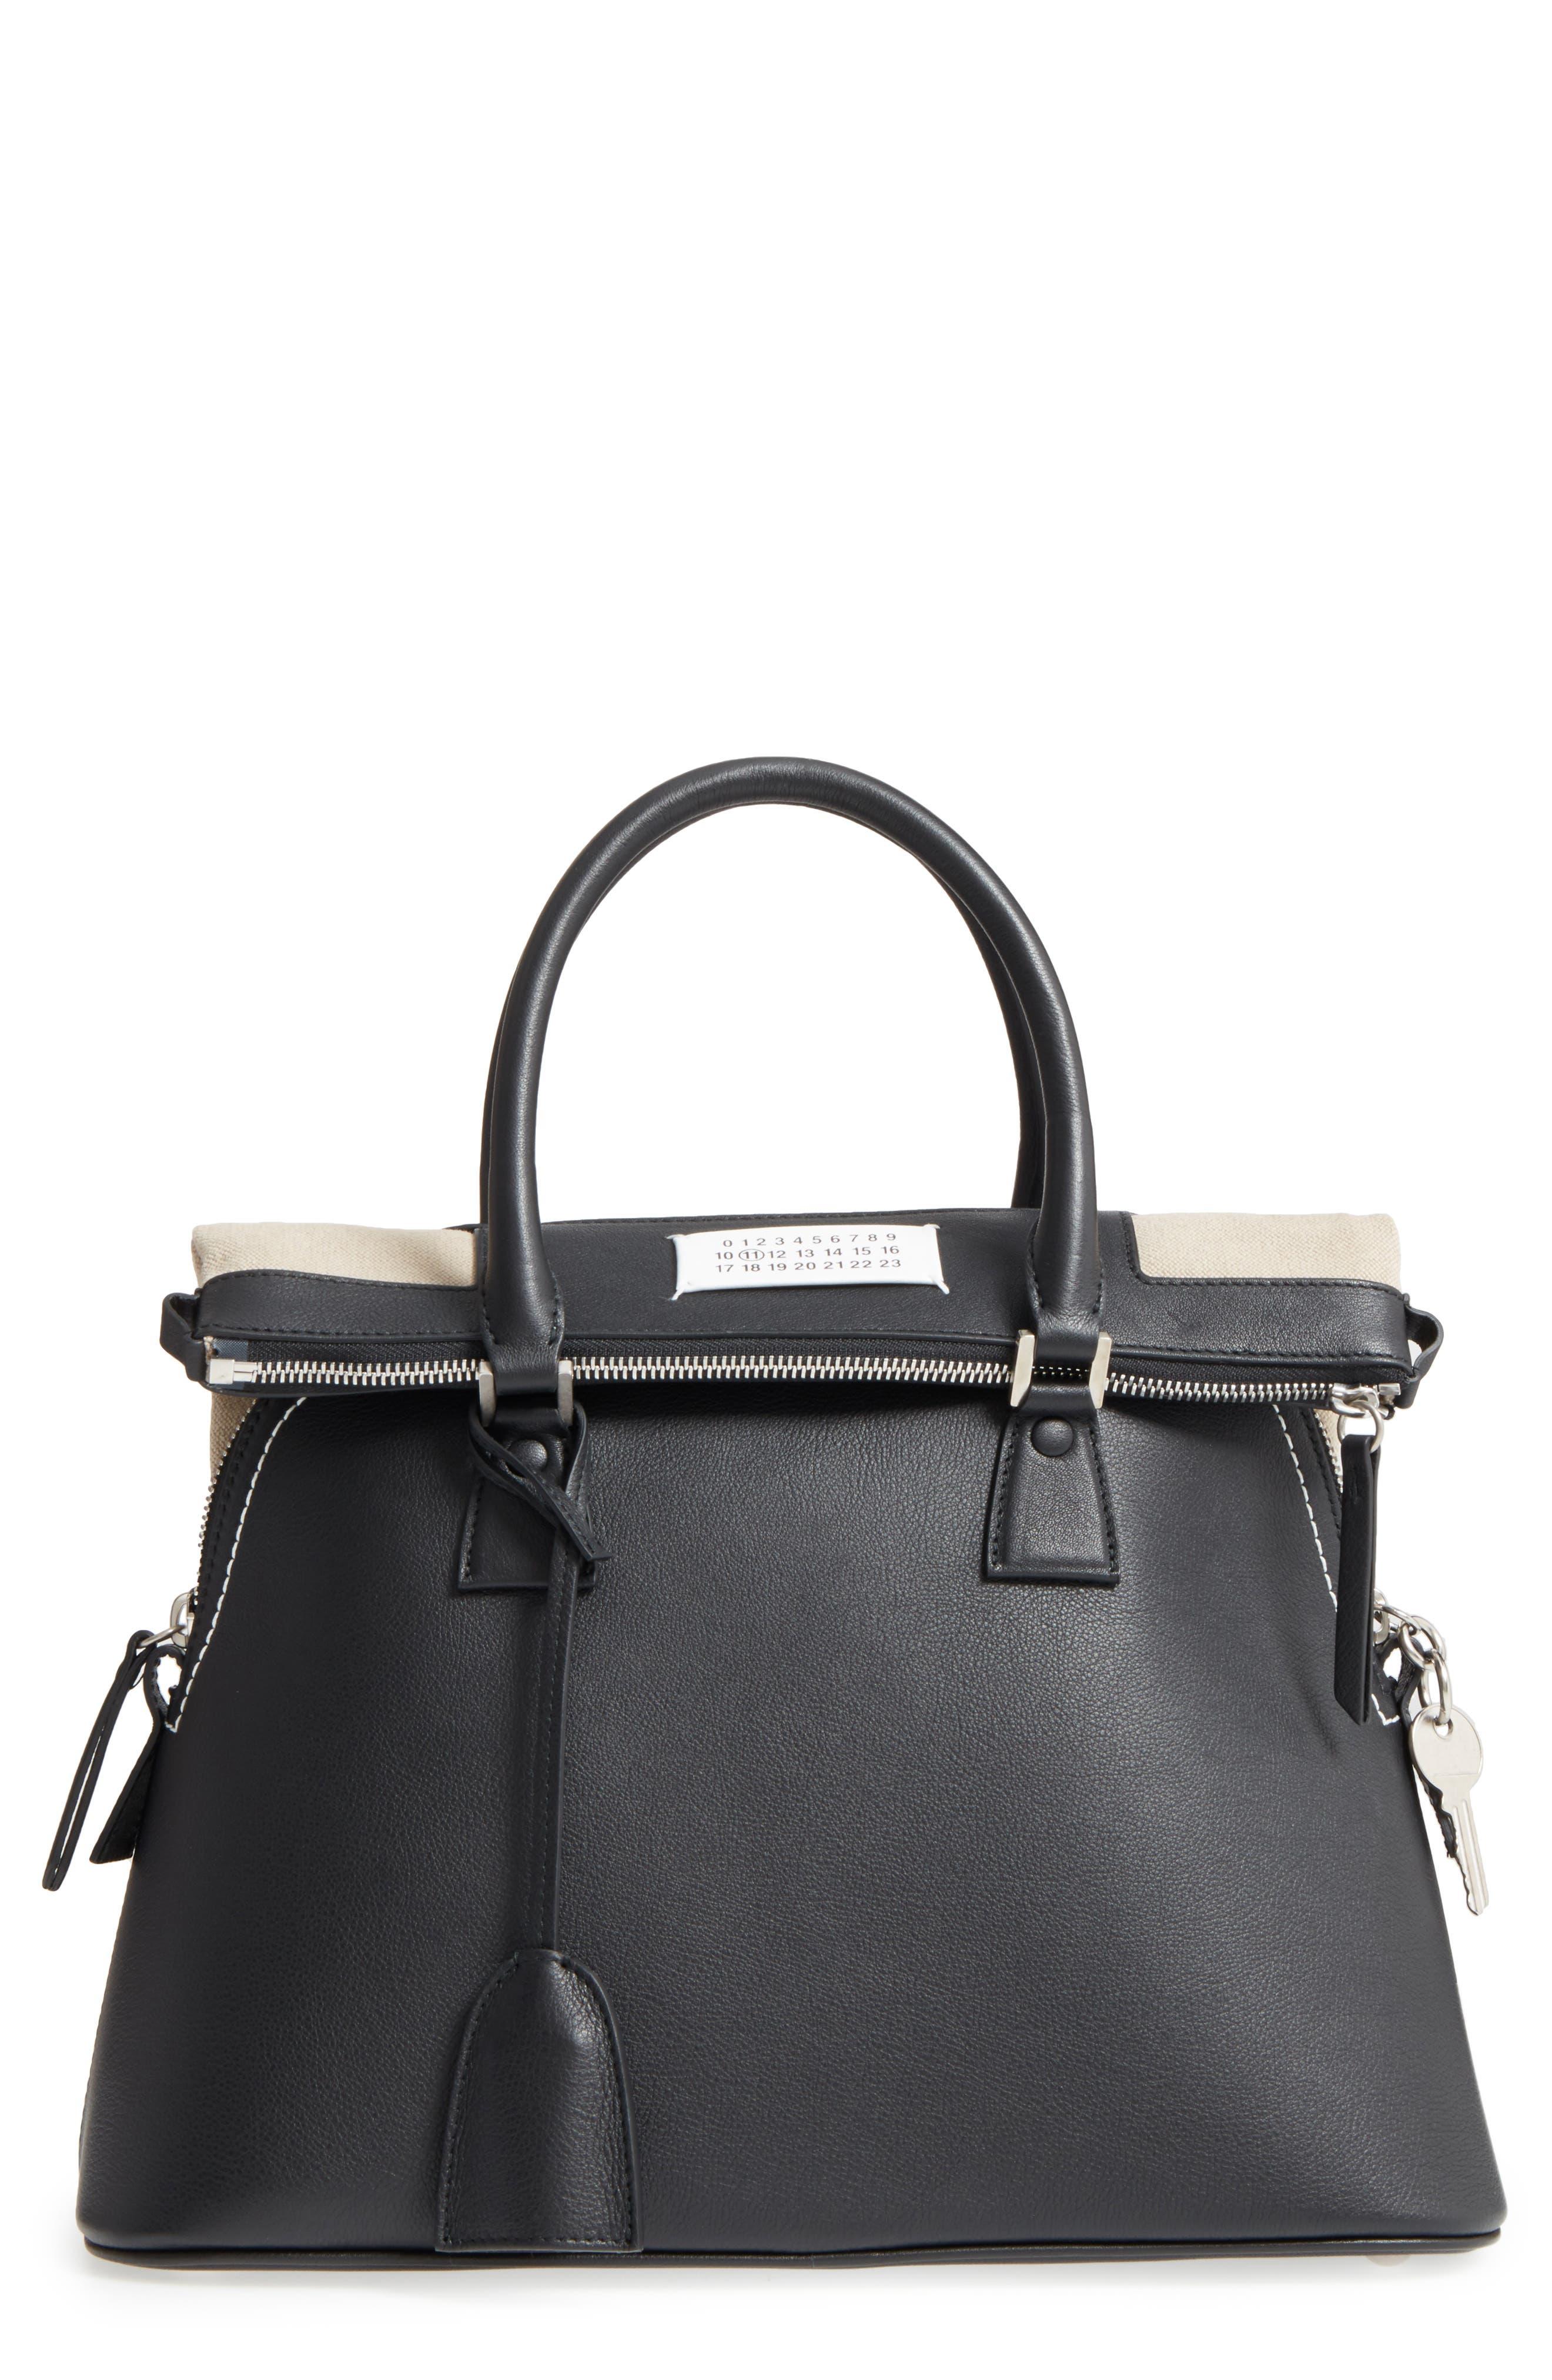 Medium 5AC Leather Handbag,                             Main thumbnail 1, color,                             Black